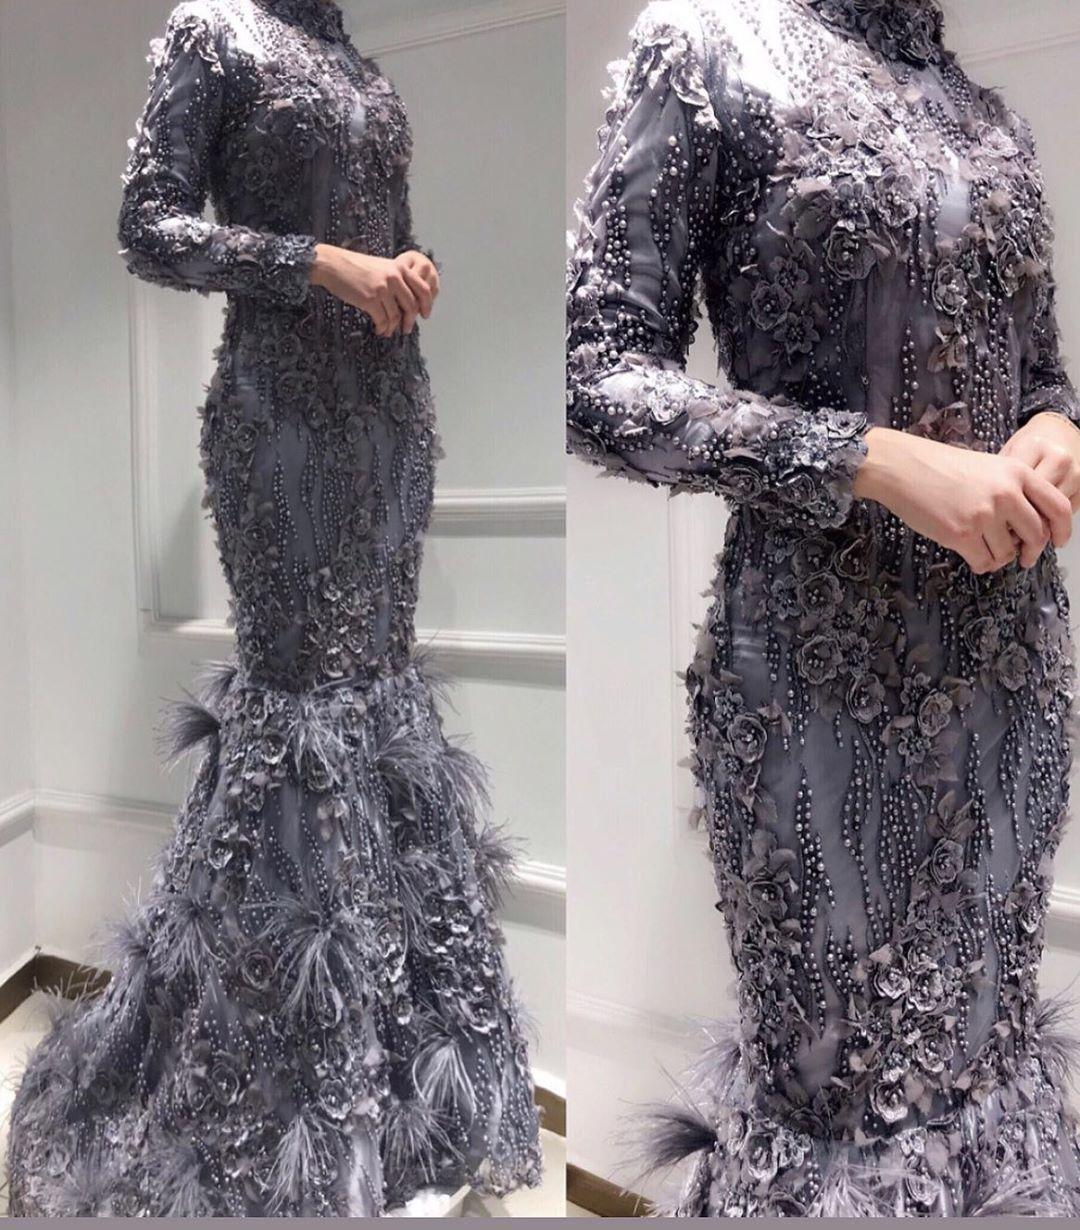 "Photo of Fashion Designer|Gülcan Selçuk on Instagram: ""Günaydın💫✨#lazazagülcan #fashion #style #moda #tasarım #tesettür  #hijab #fashiondesigner #instafashion"""